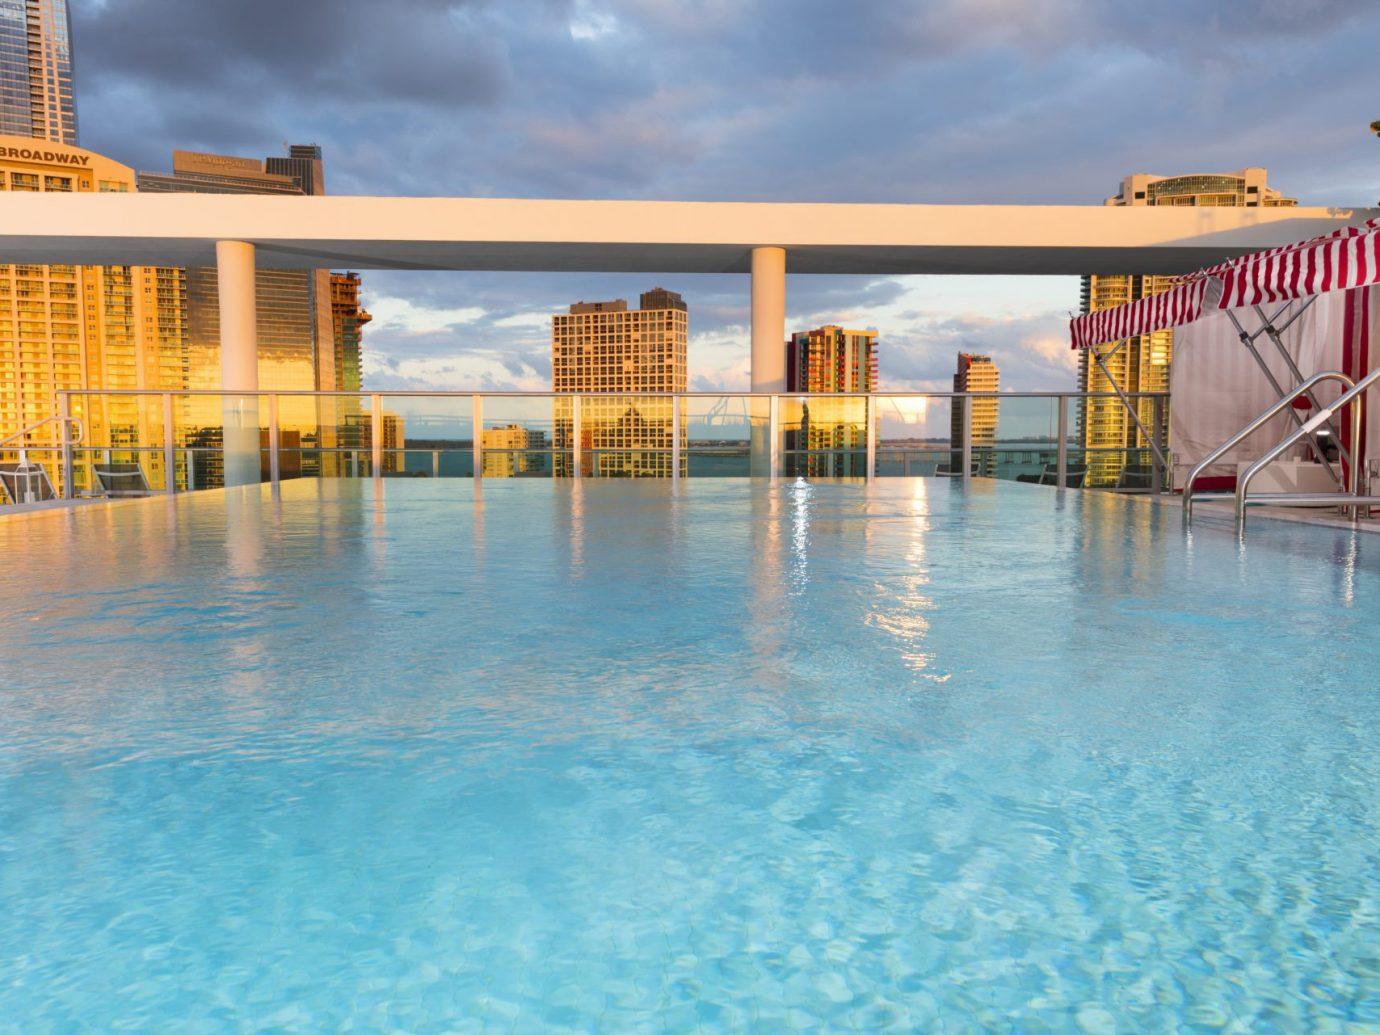 Hotels sky scene swimming pool outdoor leisure property Resort pier leisure centre estate vacation condominium Villa